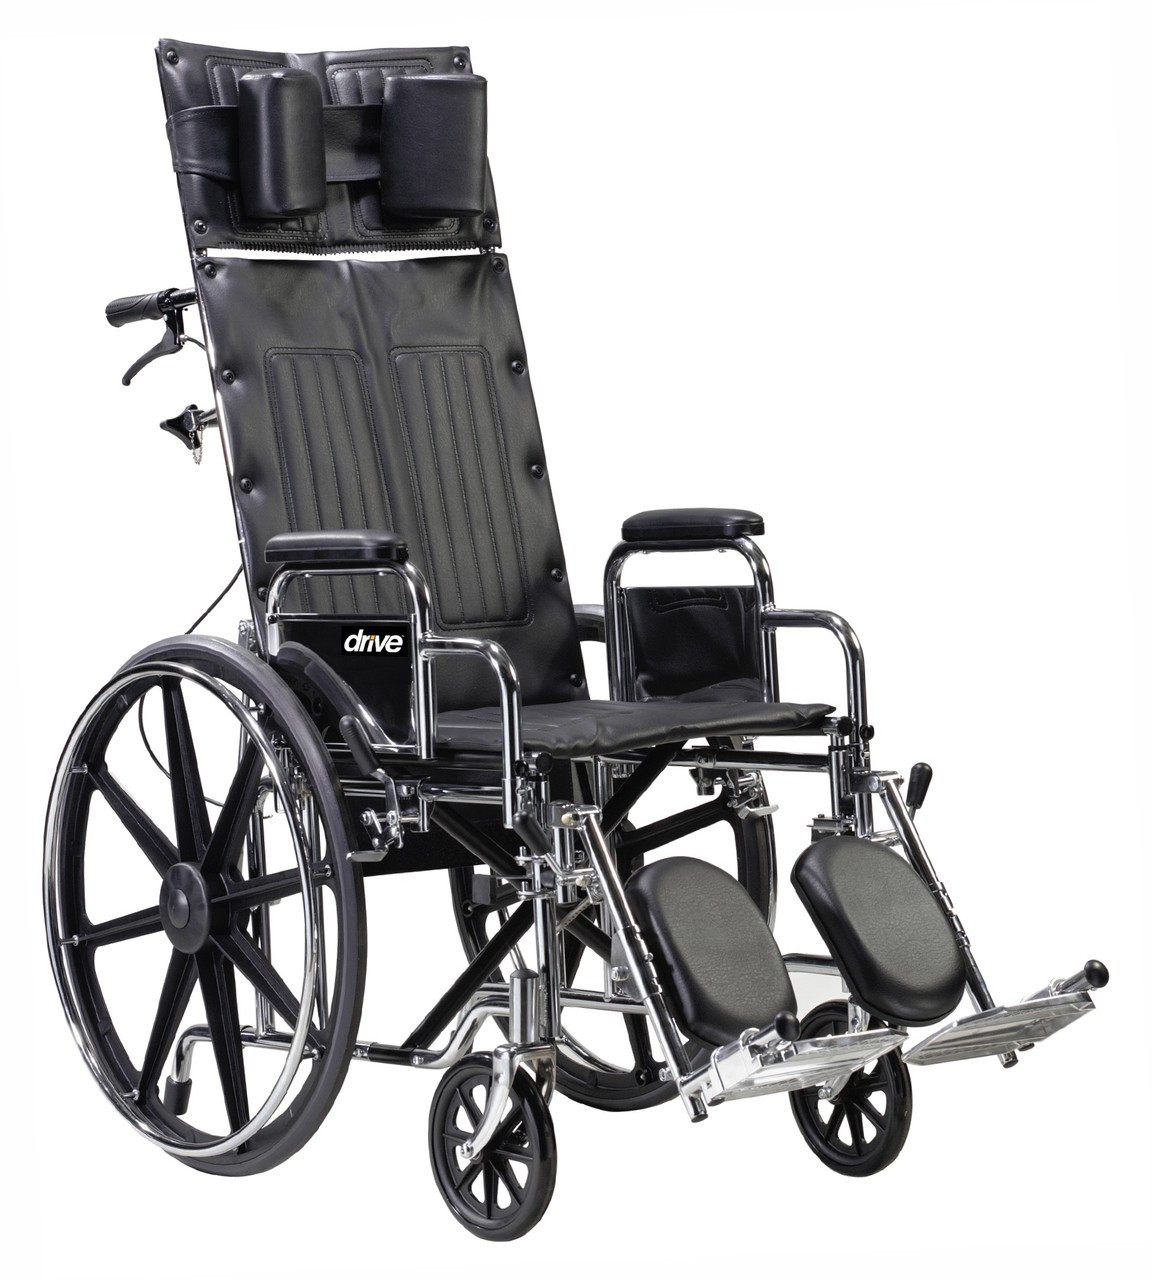 drive wheel chair desk hurts back sentra full recliner wheelchair loading zoom